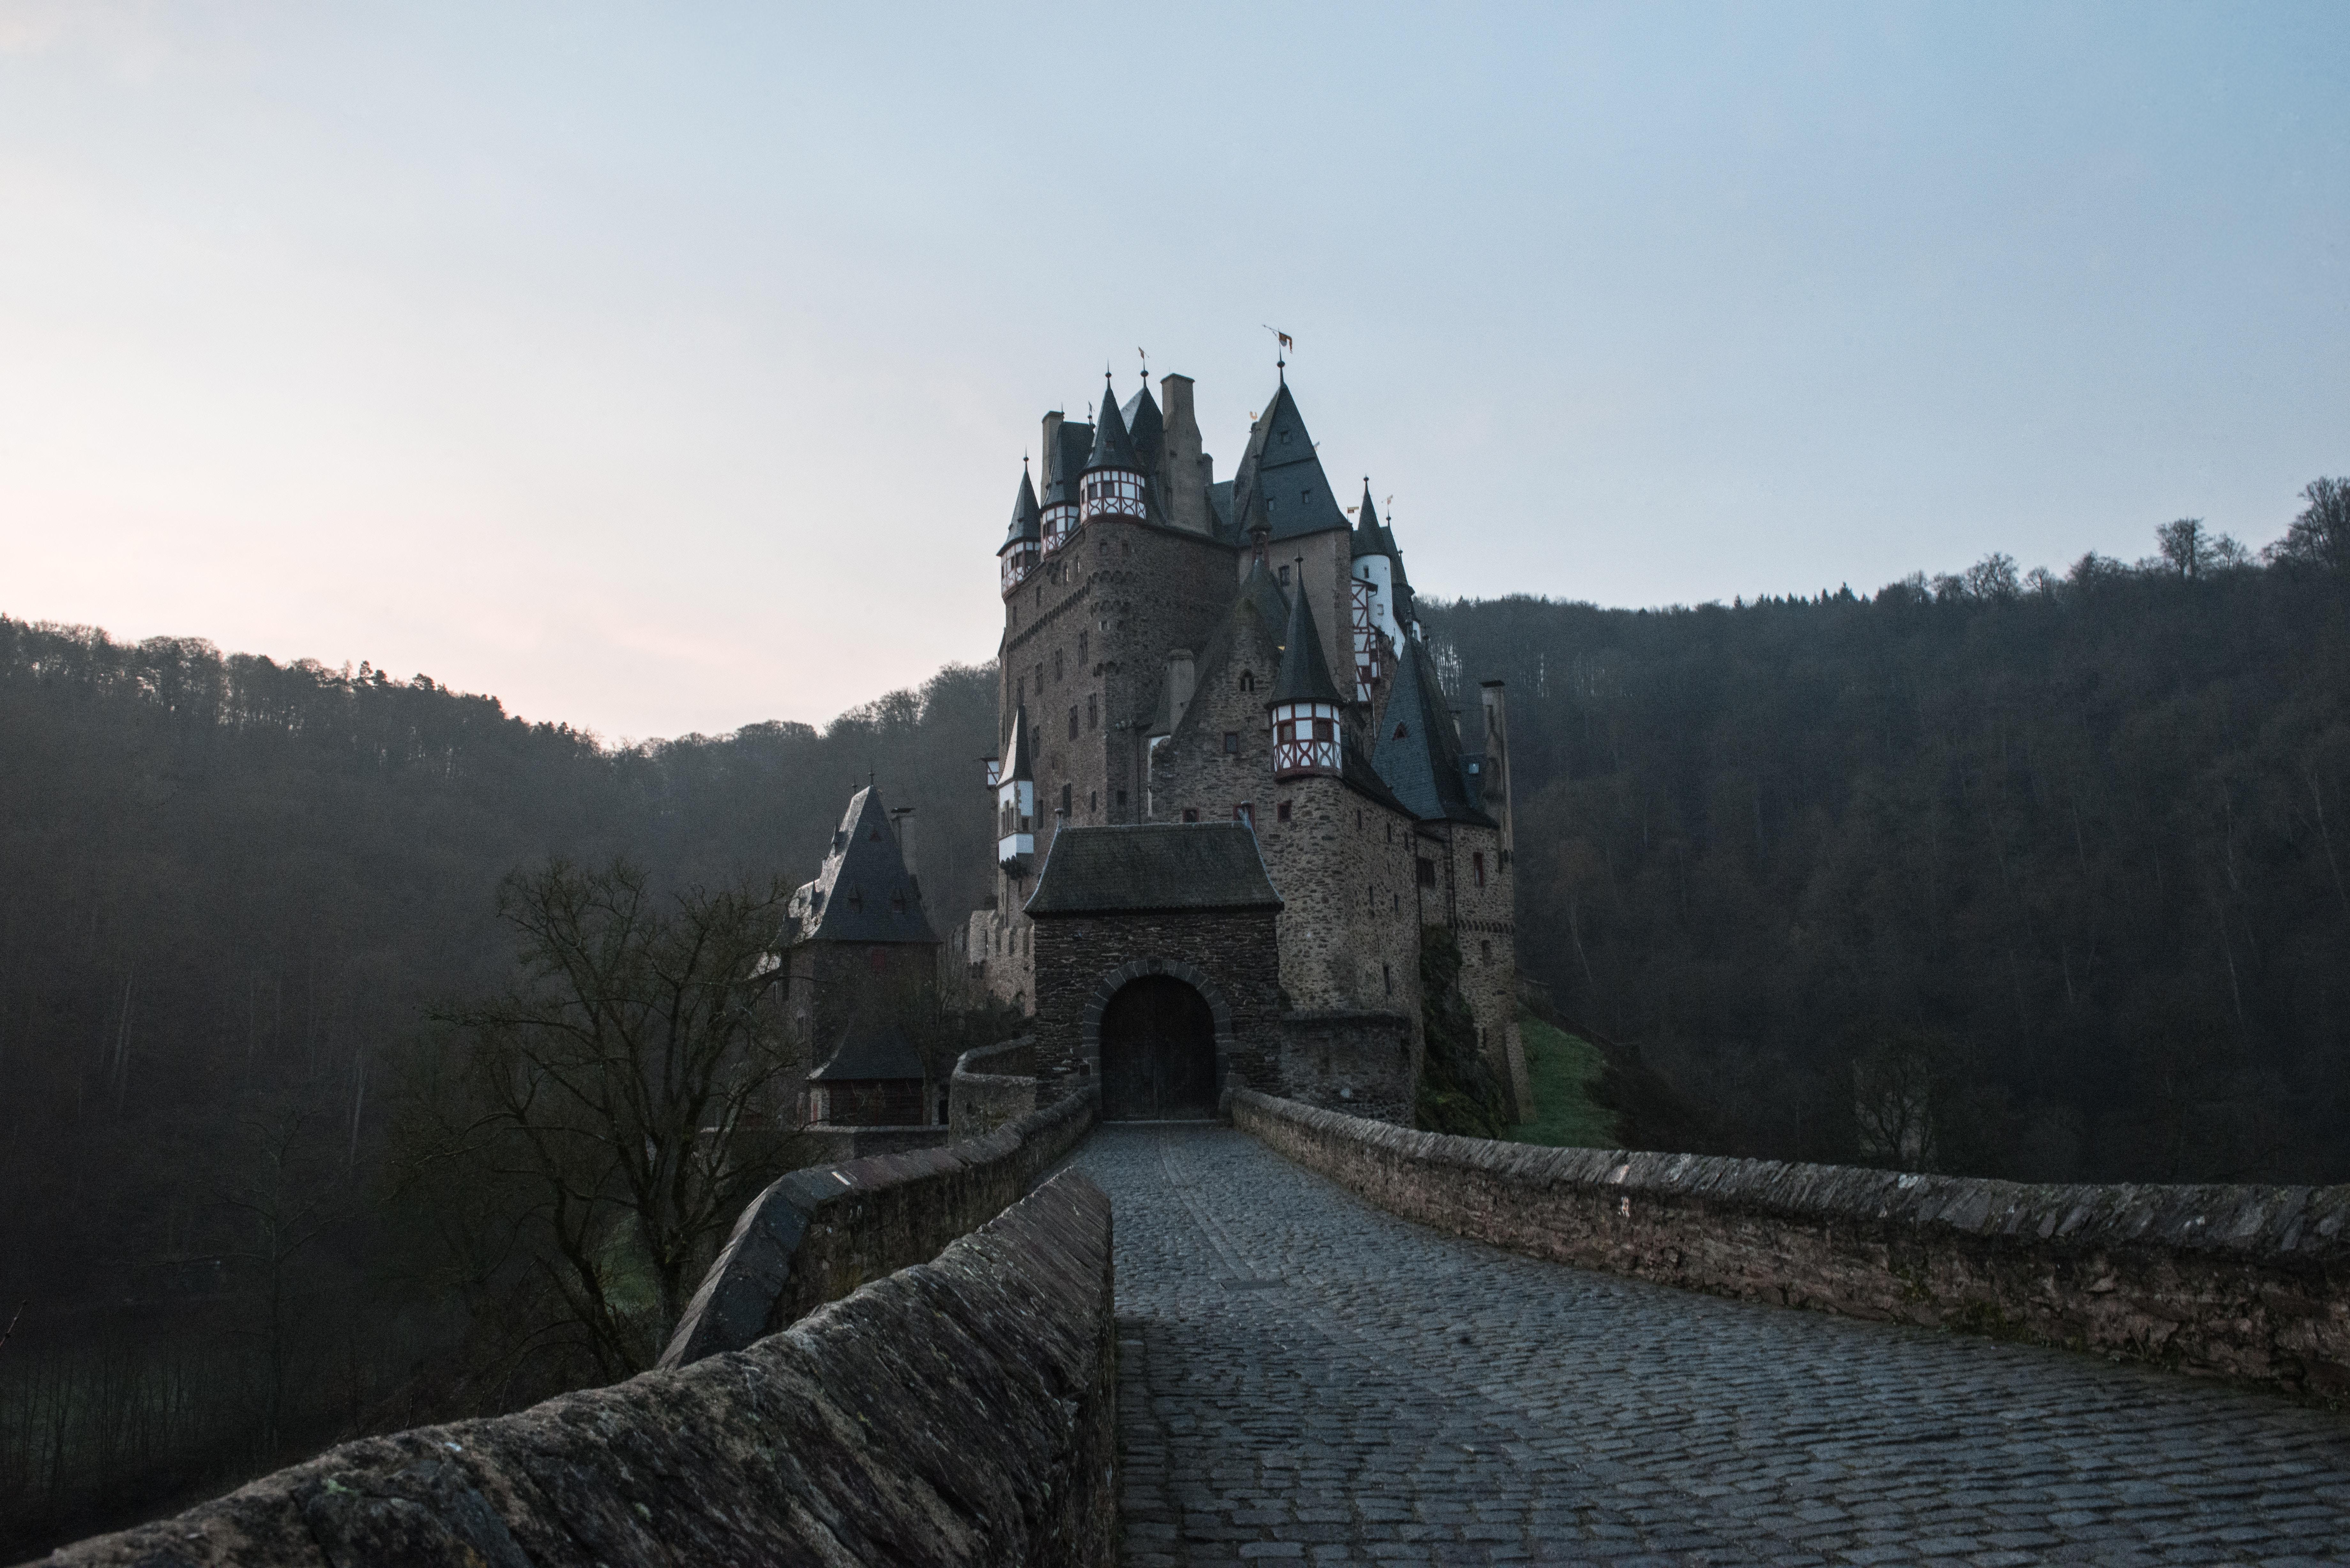 Busabout - Transylvania Halloween Trek (Unsplash.com.au @sandramode)